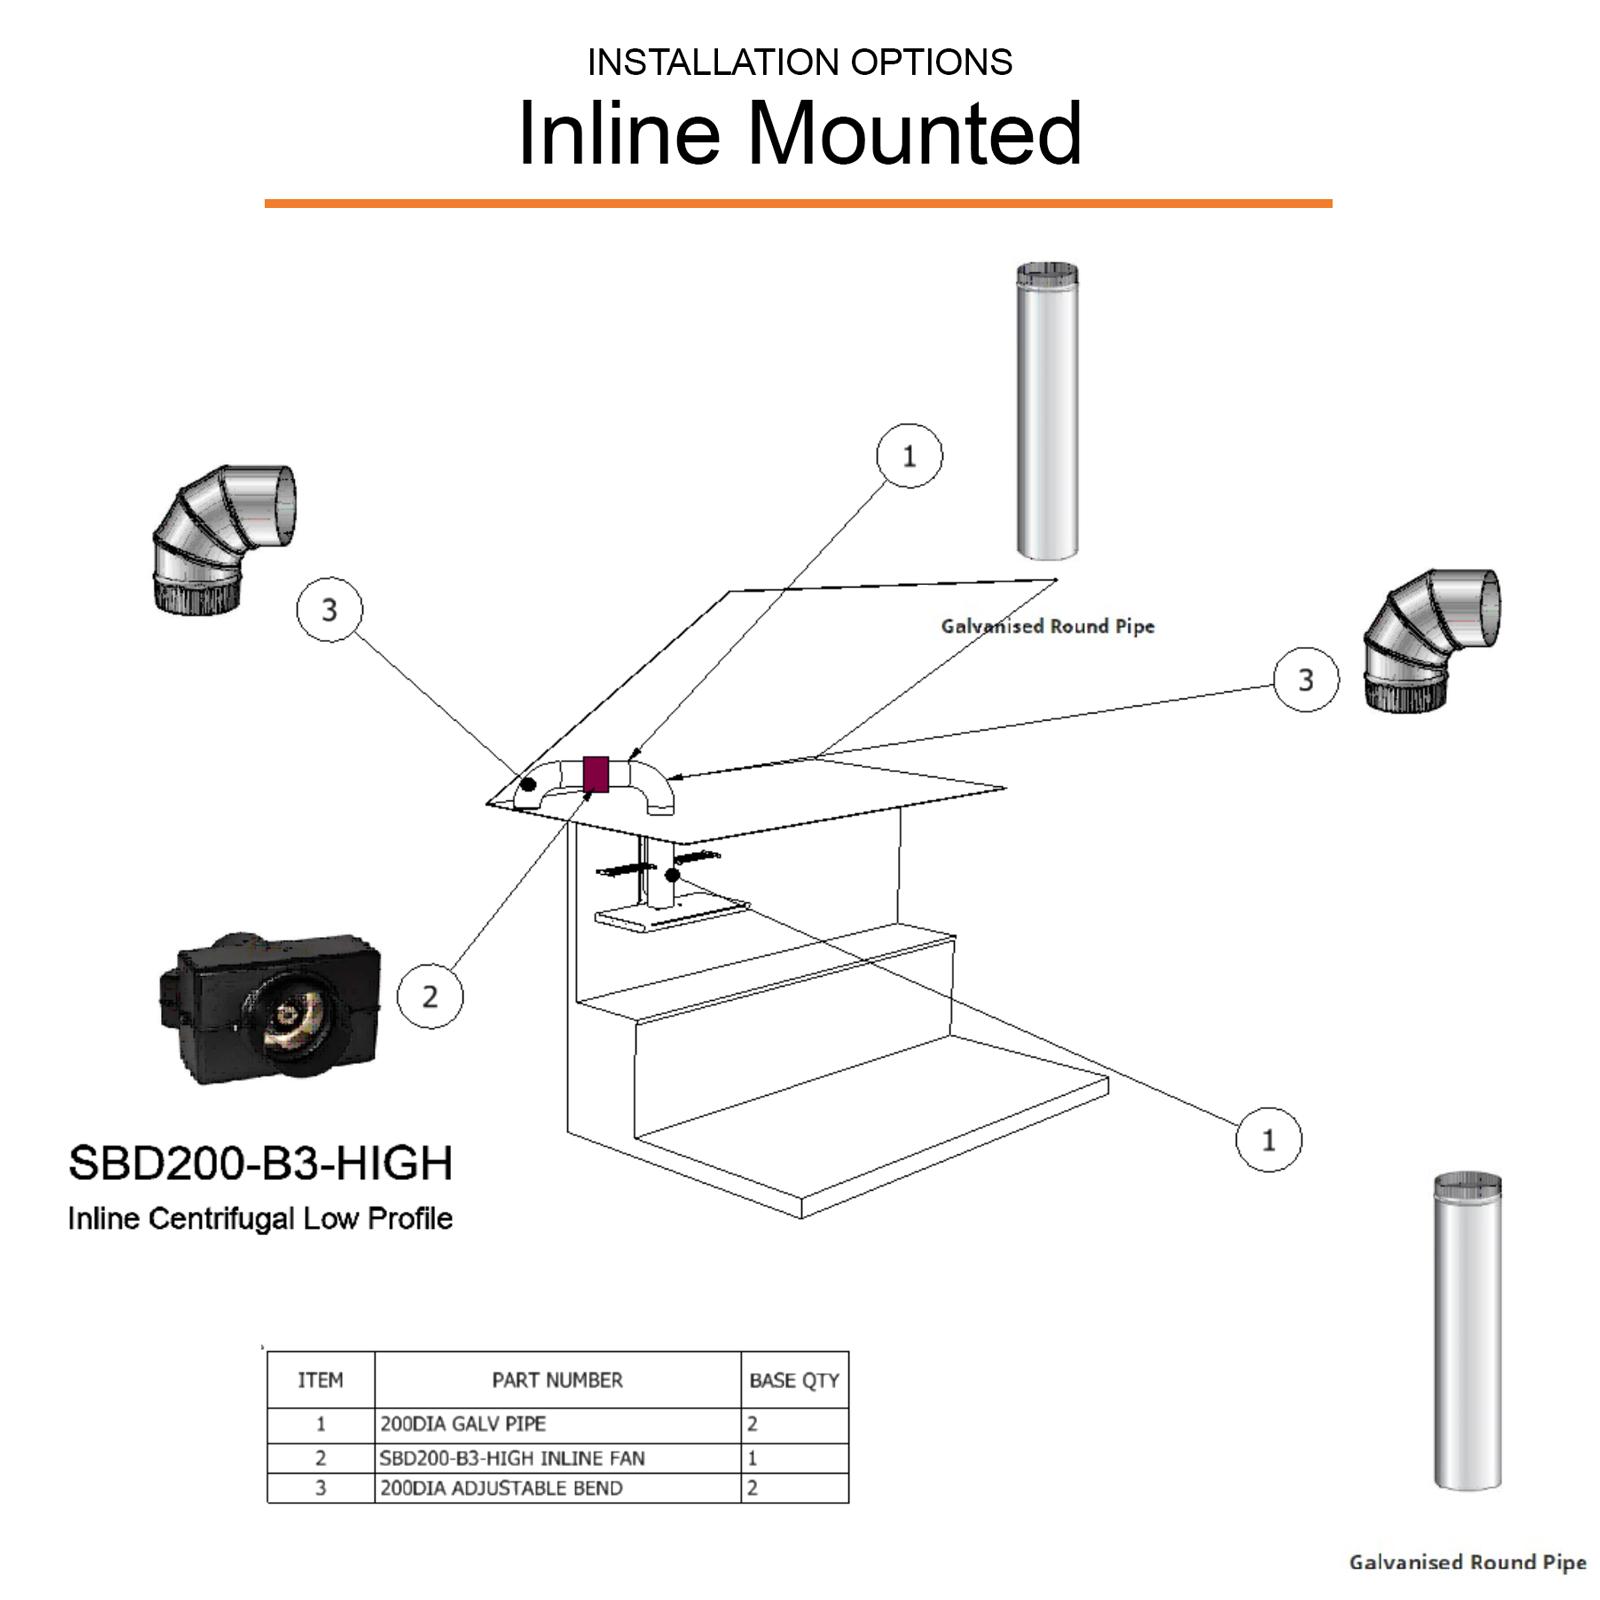 Range hood installation ducting options - inline mounted